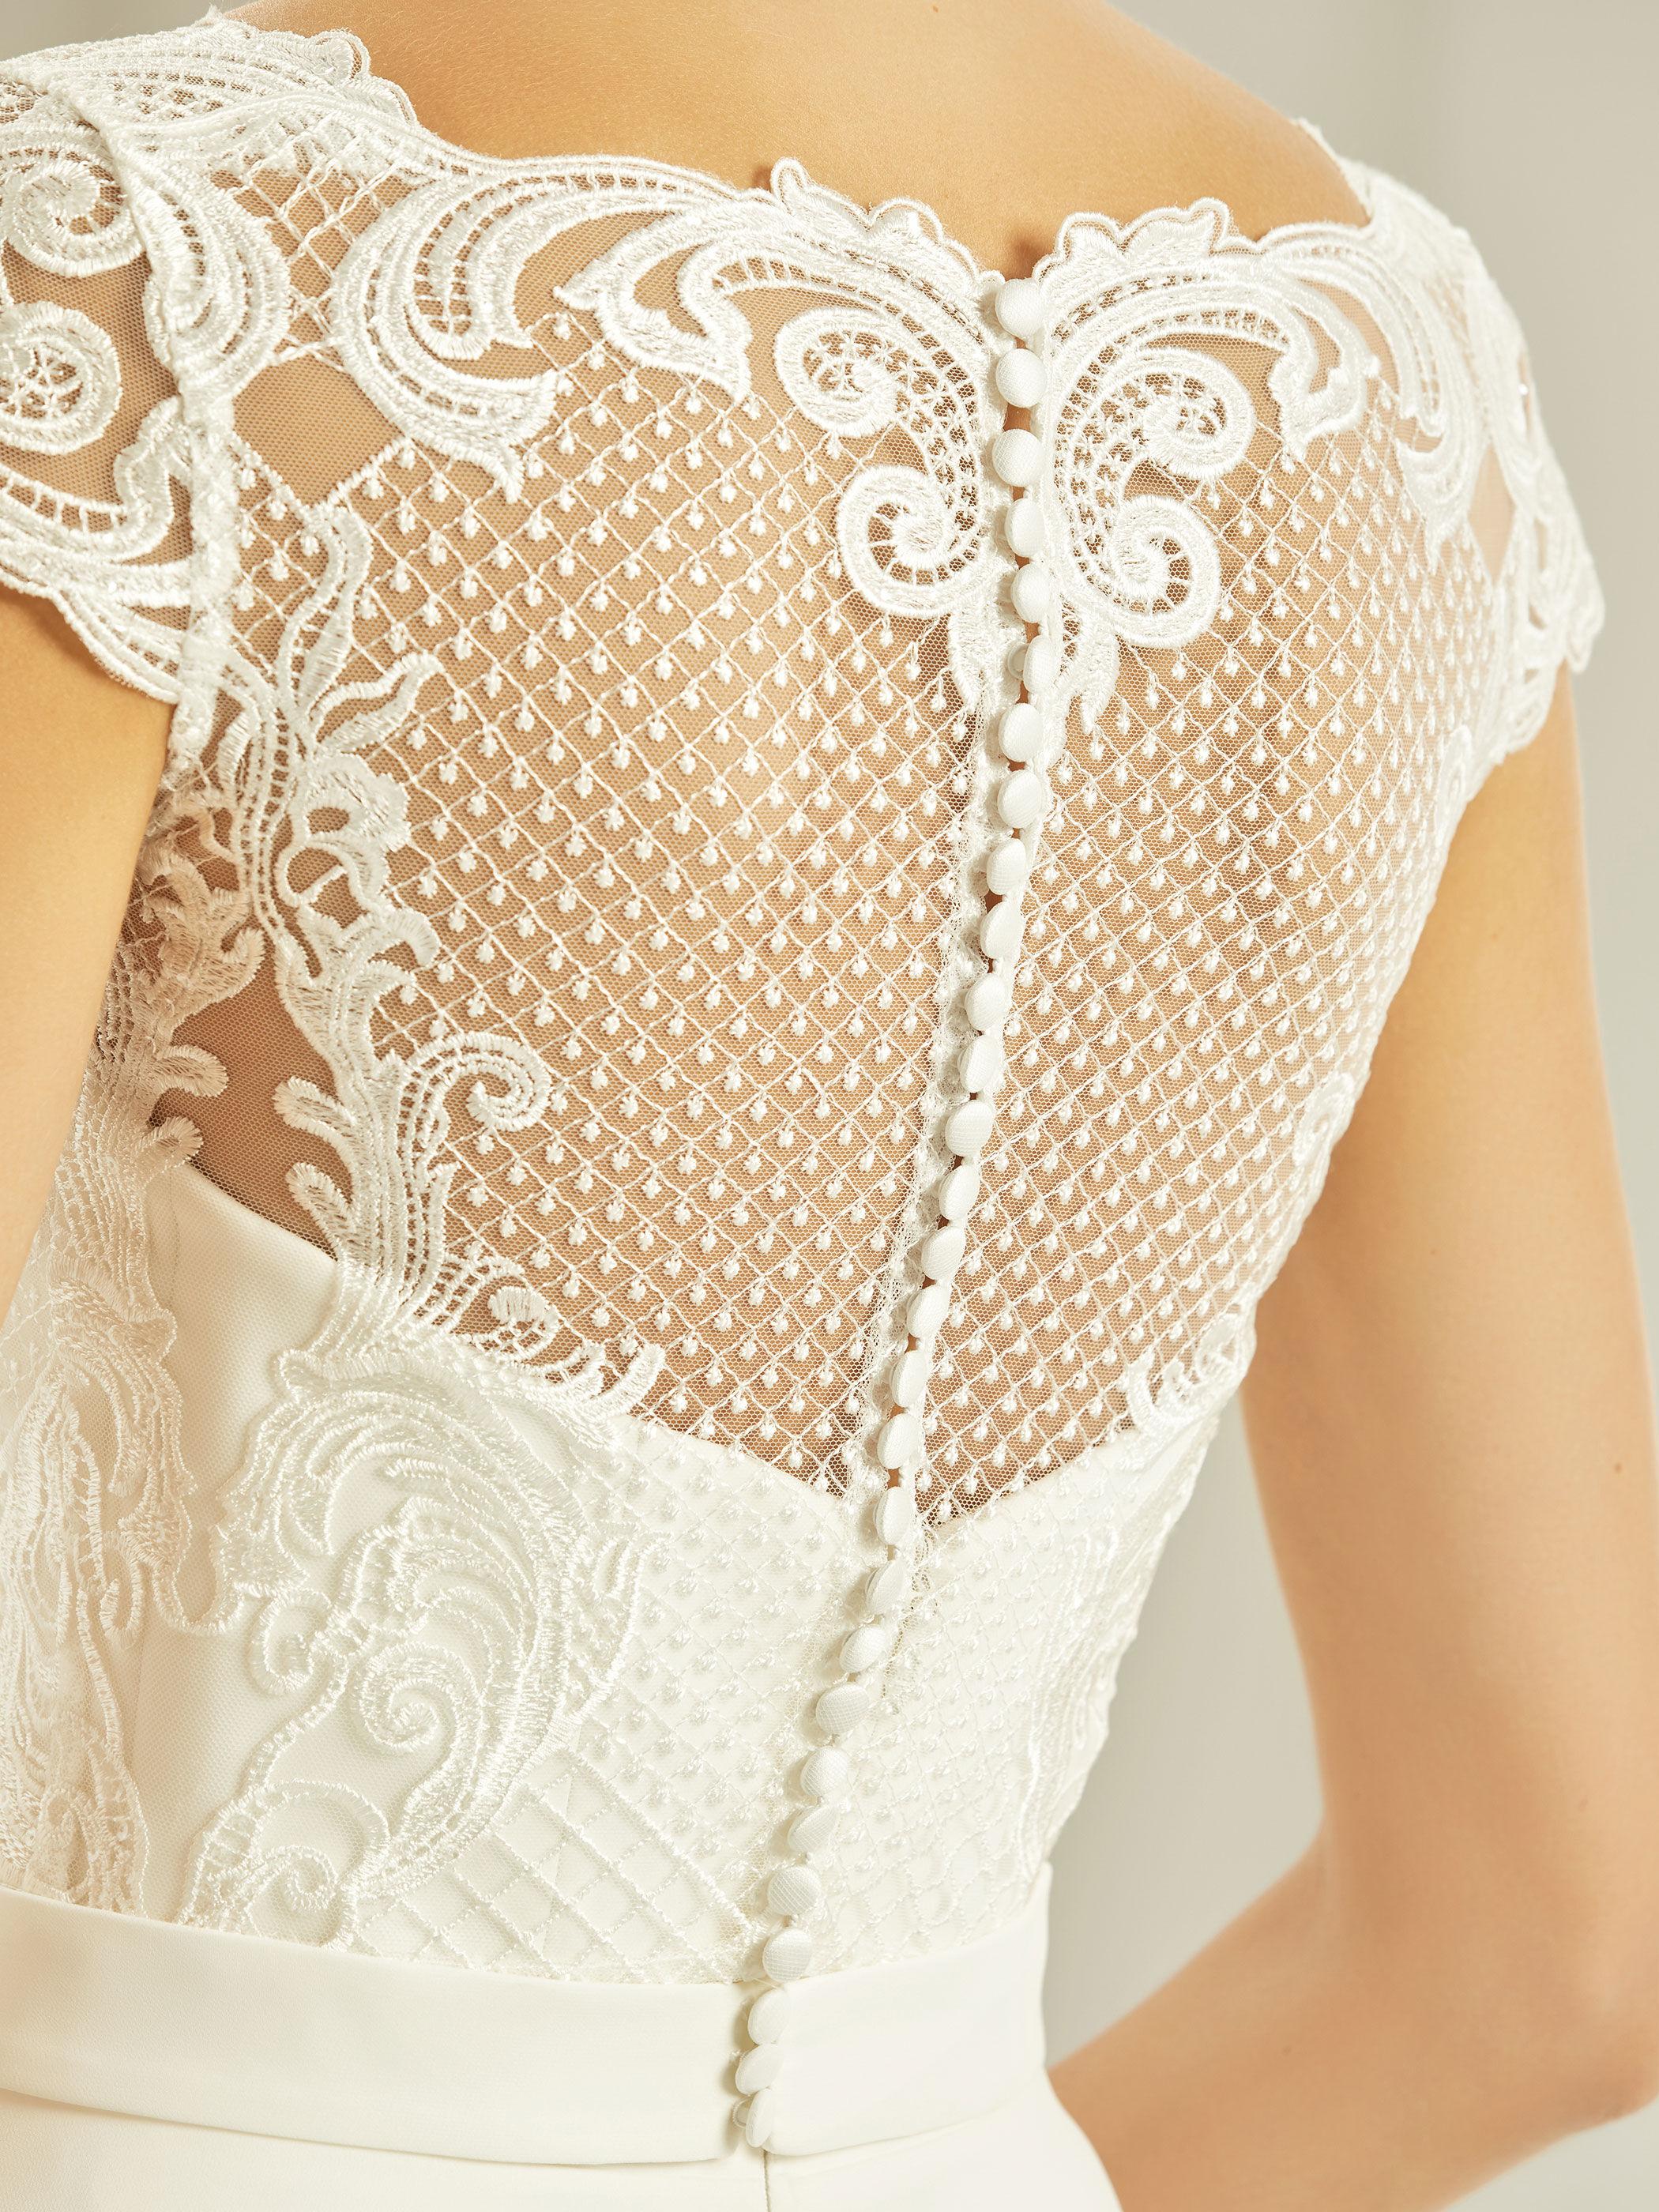 bianco-evento-bridal-bolero-e269-_3__1.j